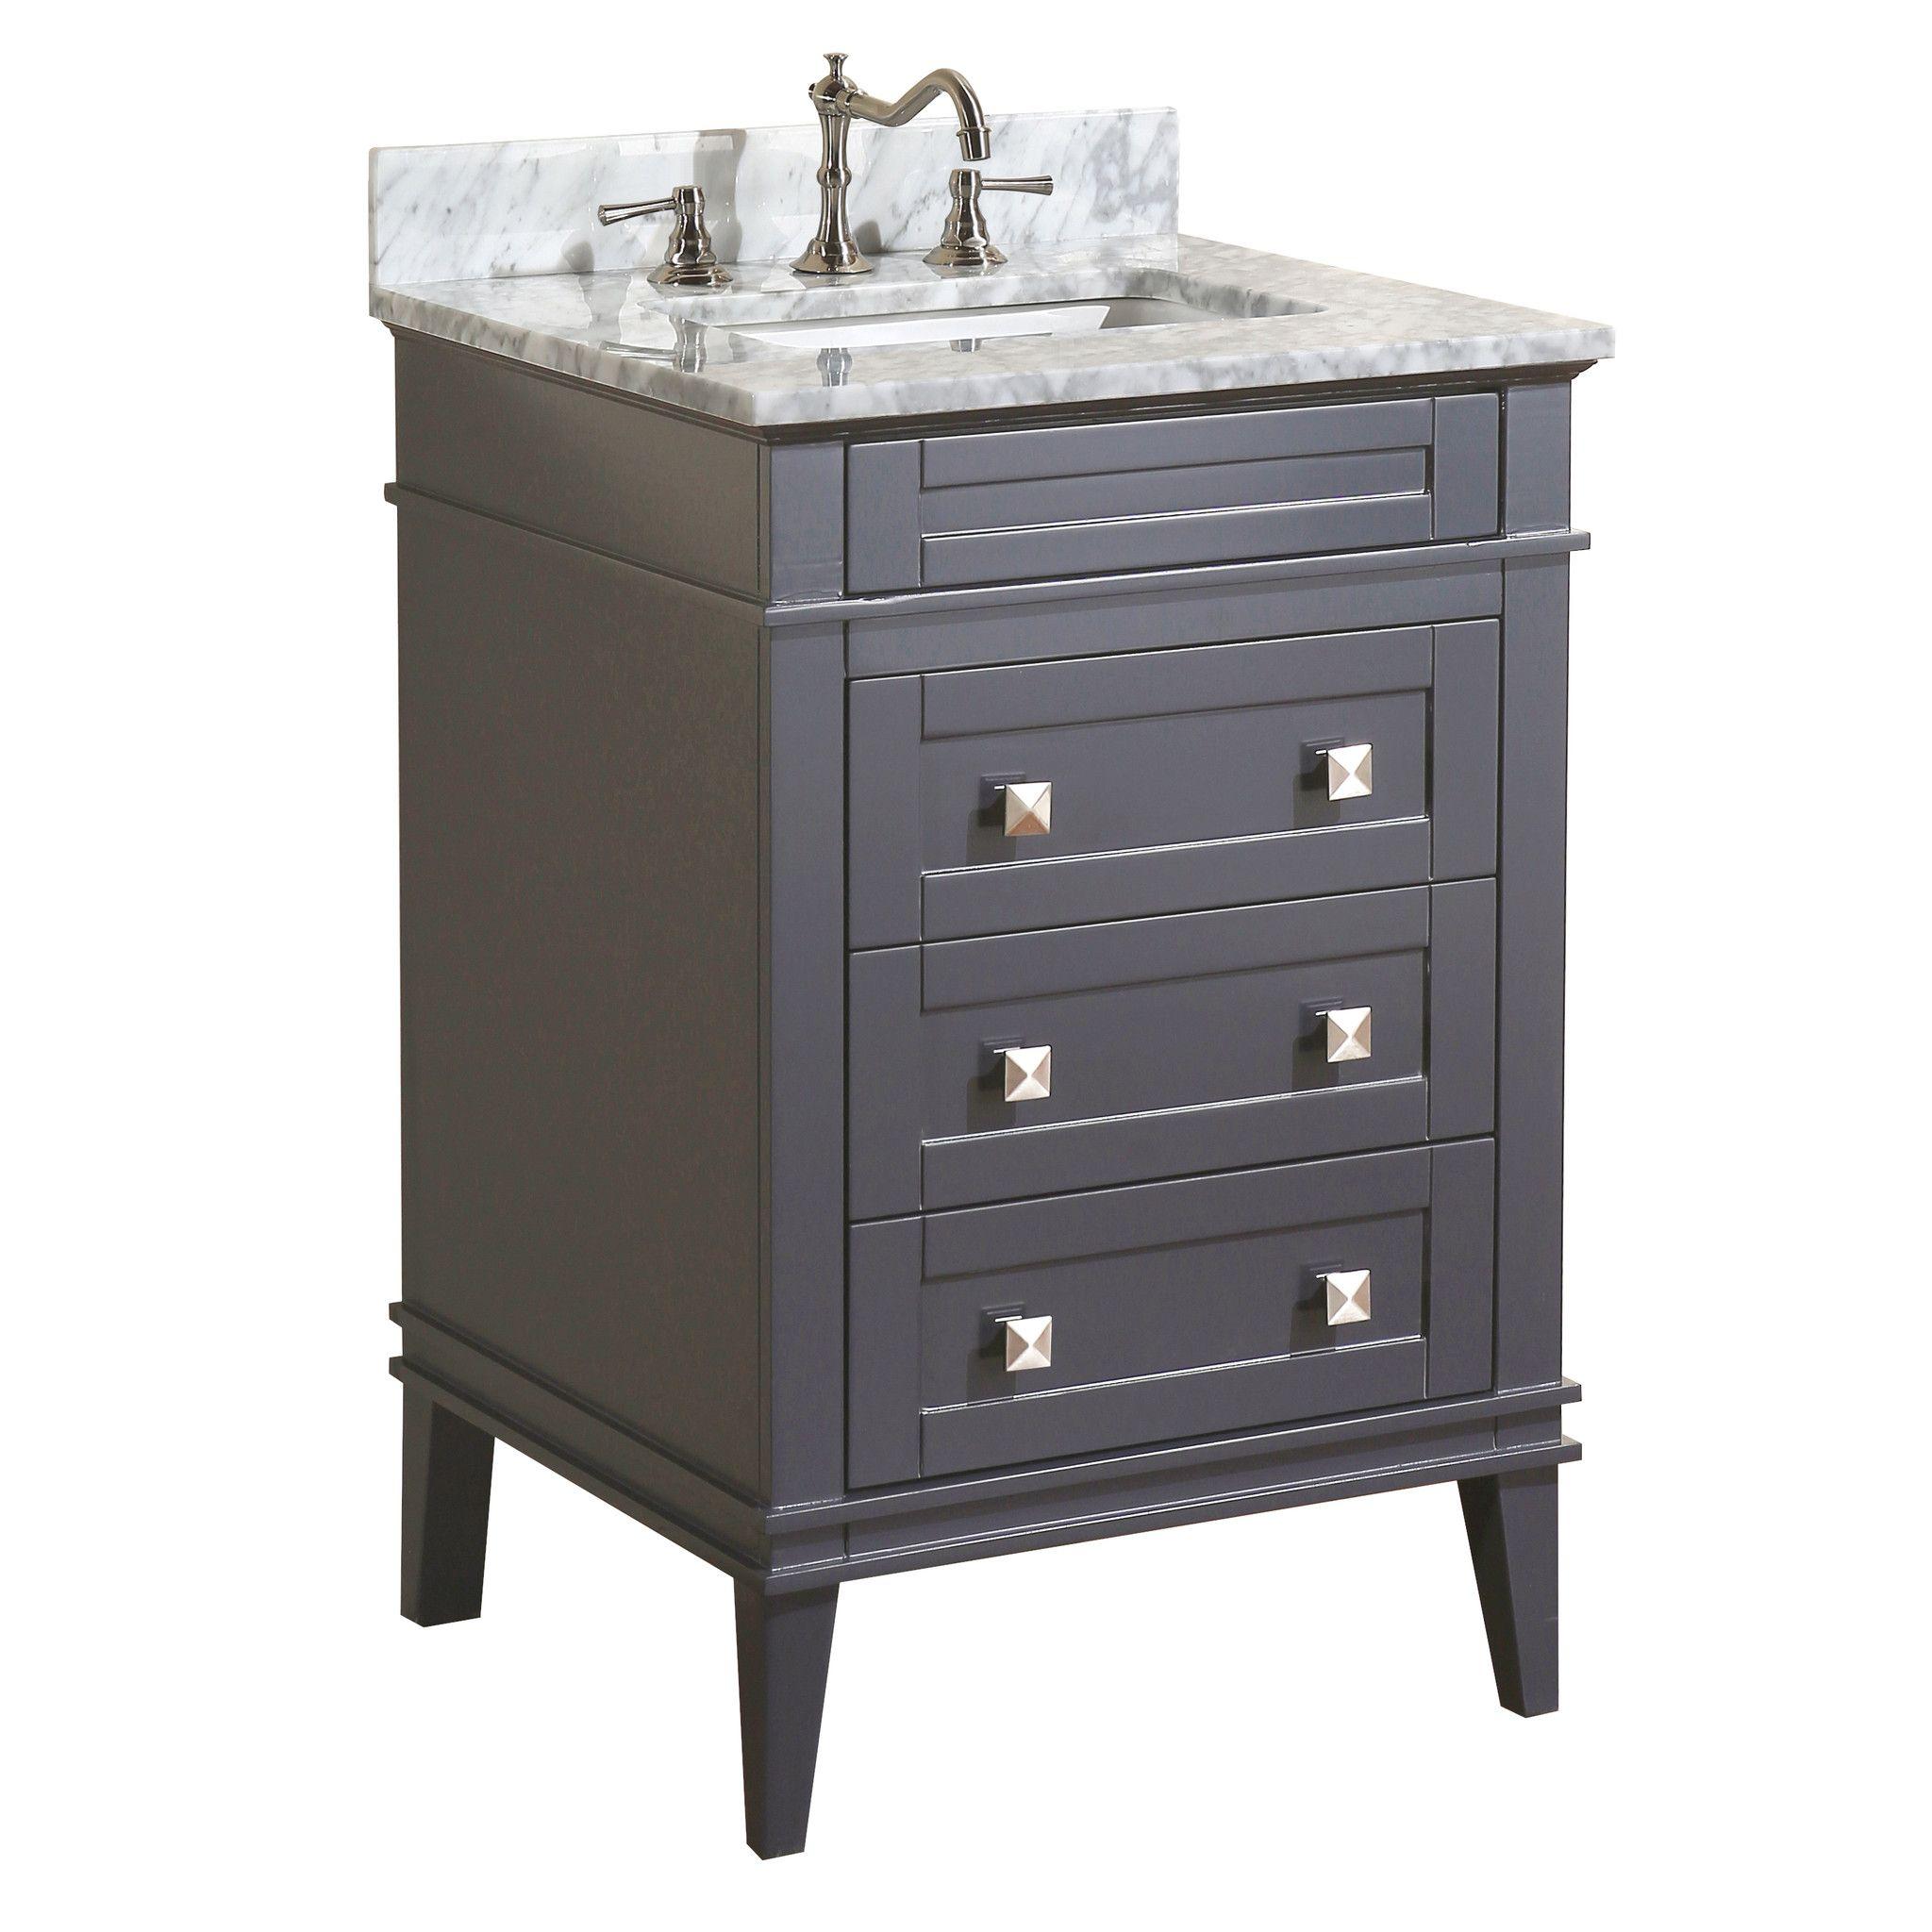 Eleanor 24-inch Vanity (Carrara/Charcoal Gray)